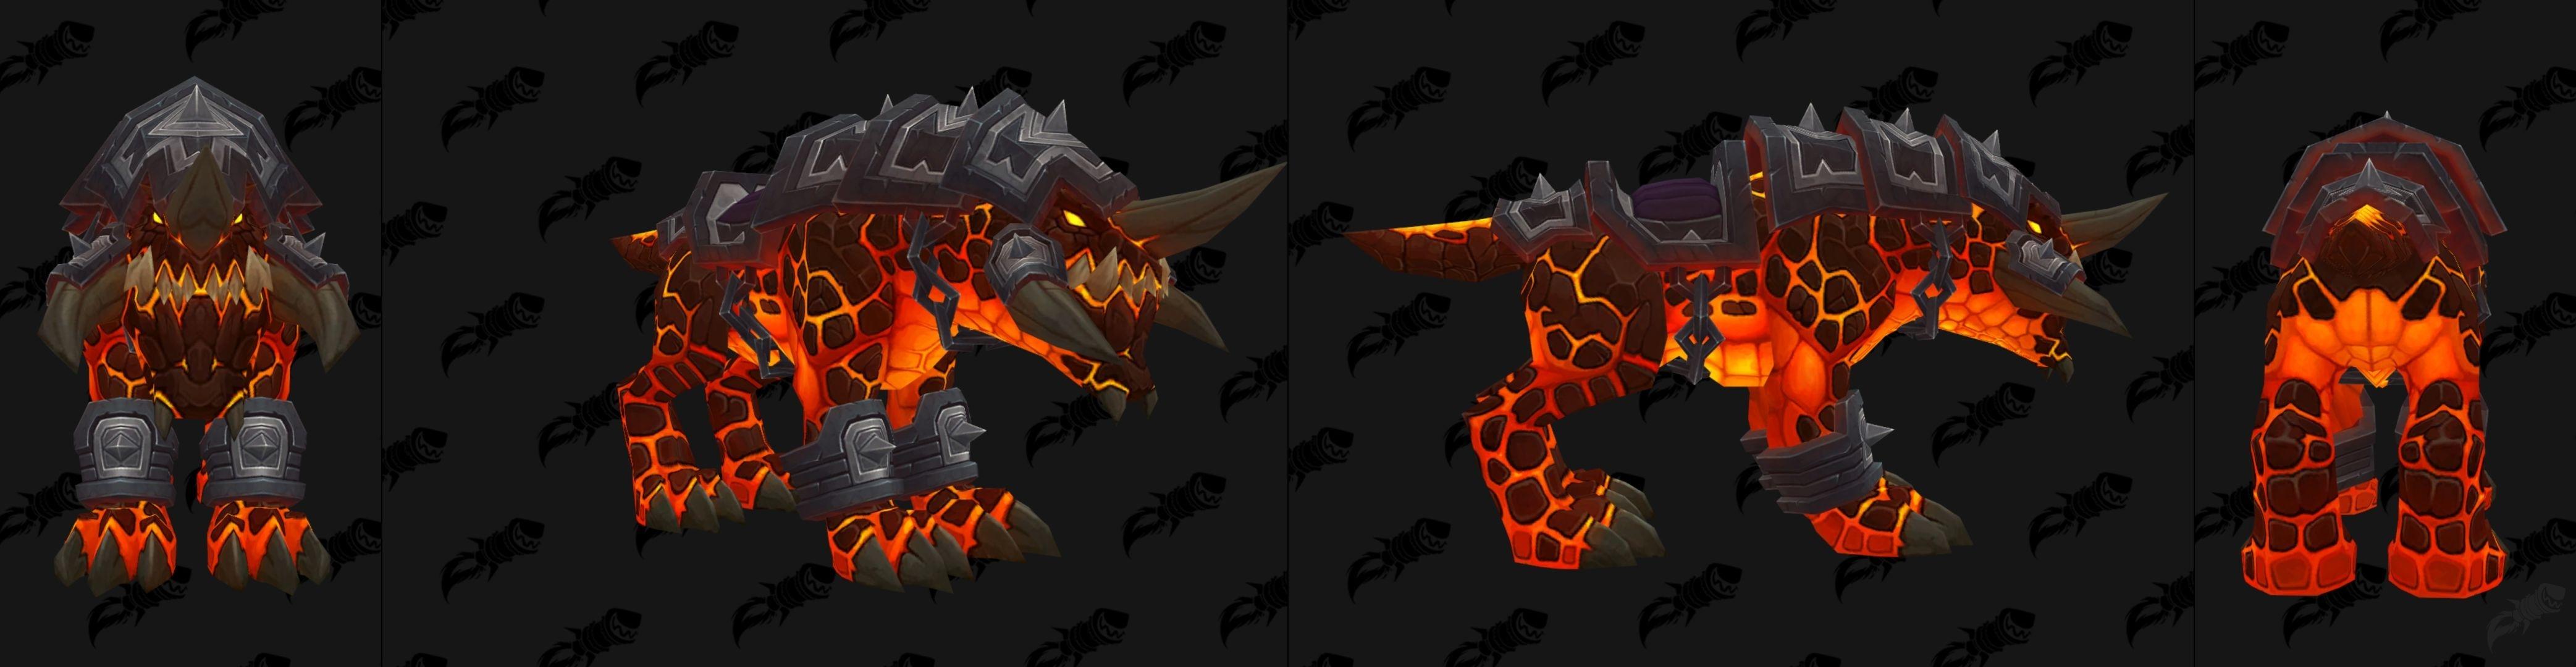 Dark Iron Dwarf Now Playable - Unlock Scenario - Wowhead News